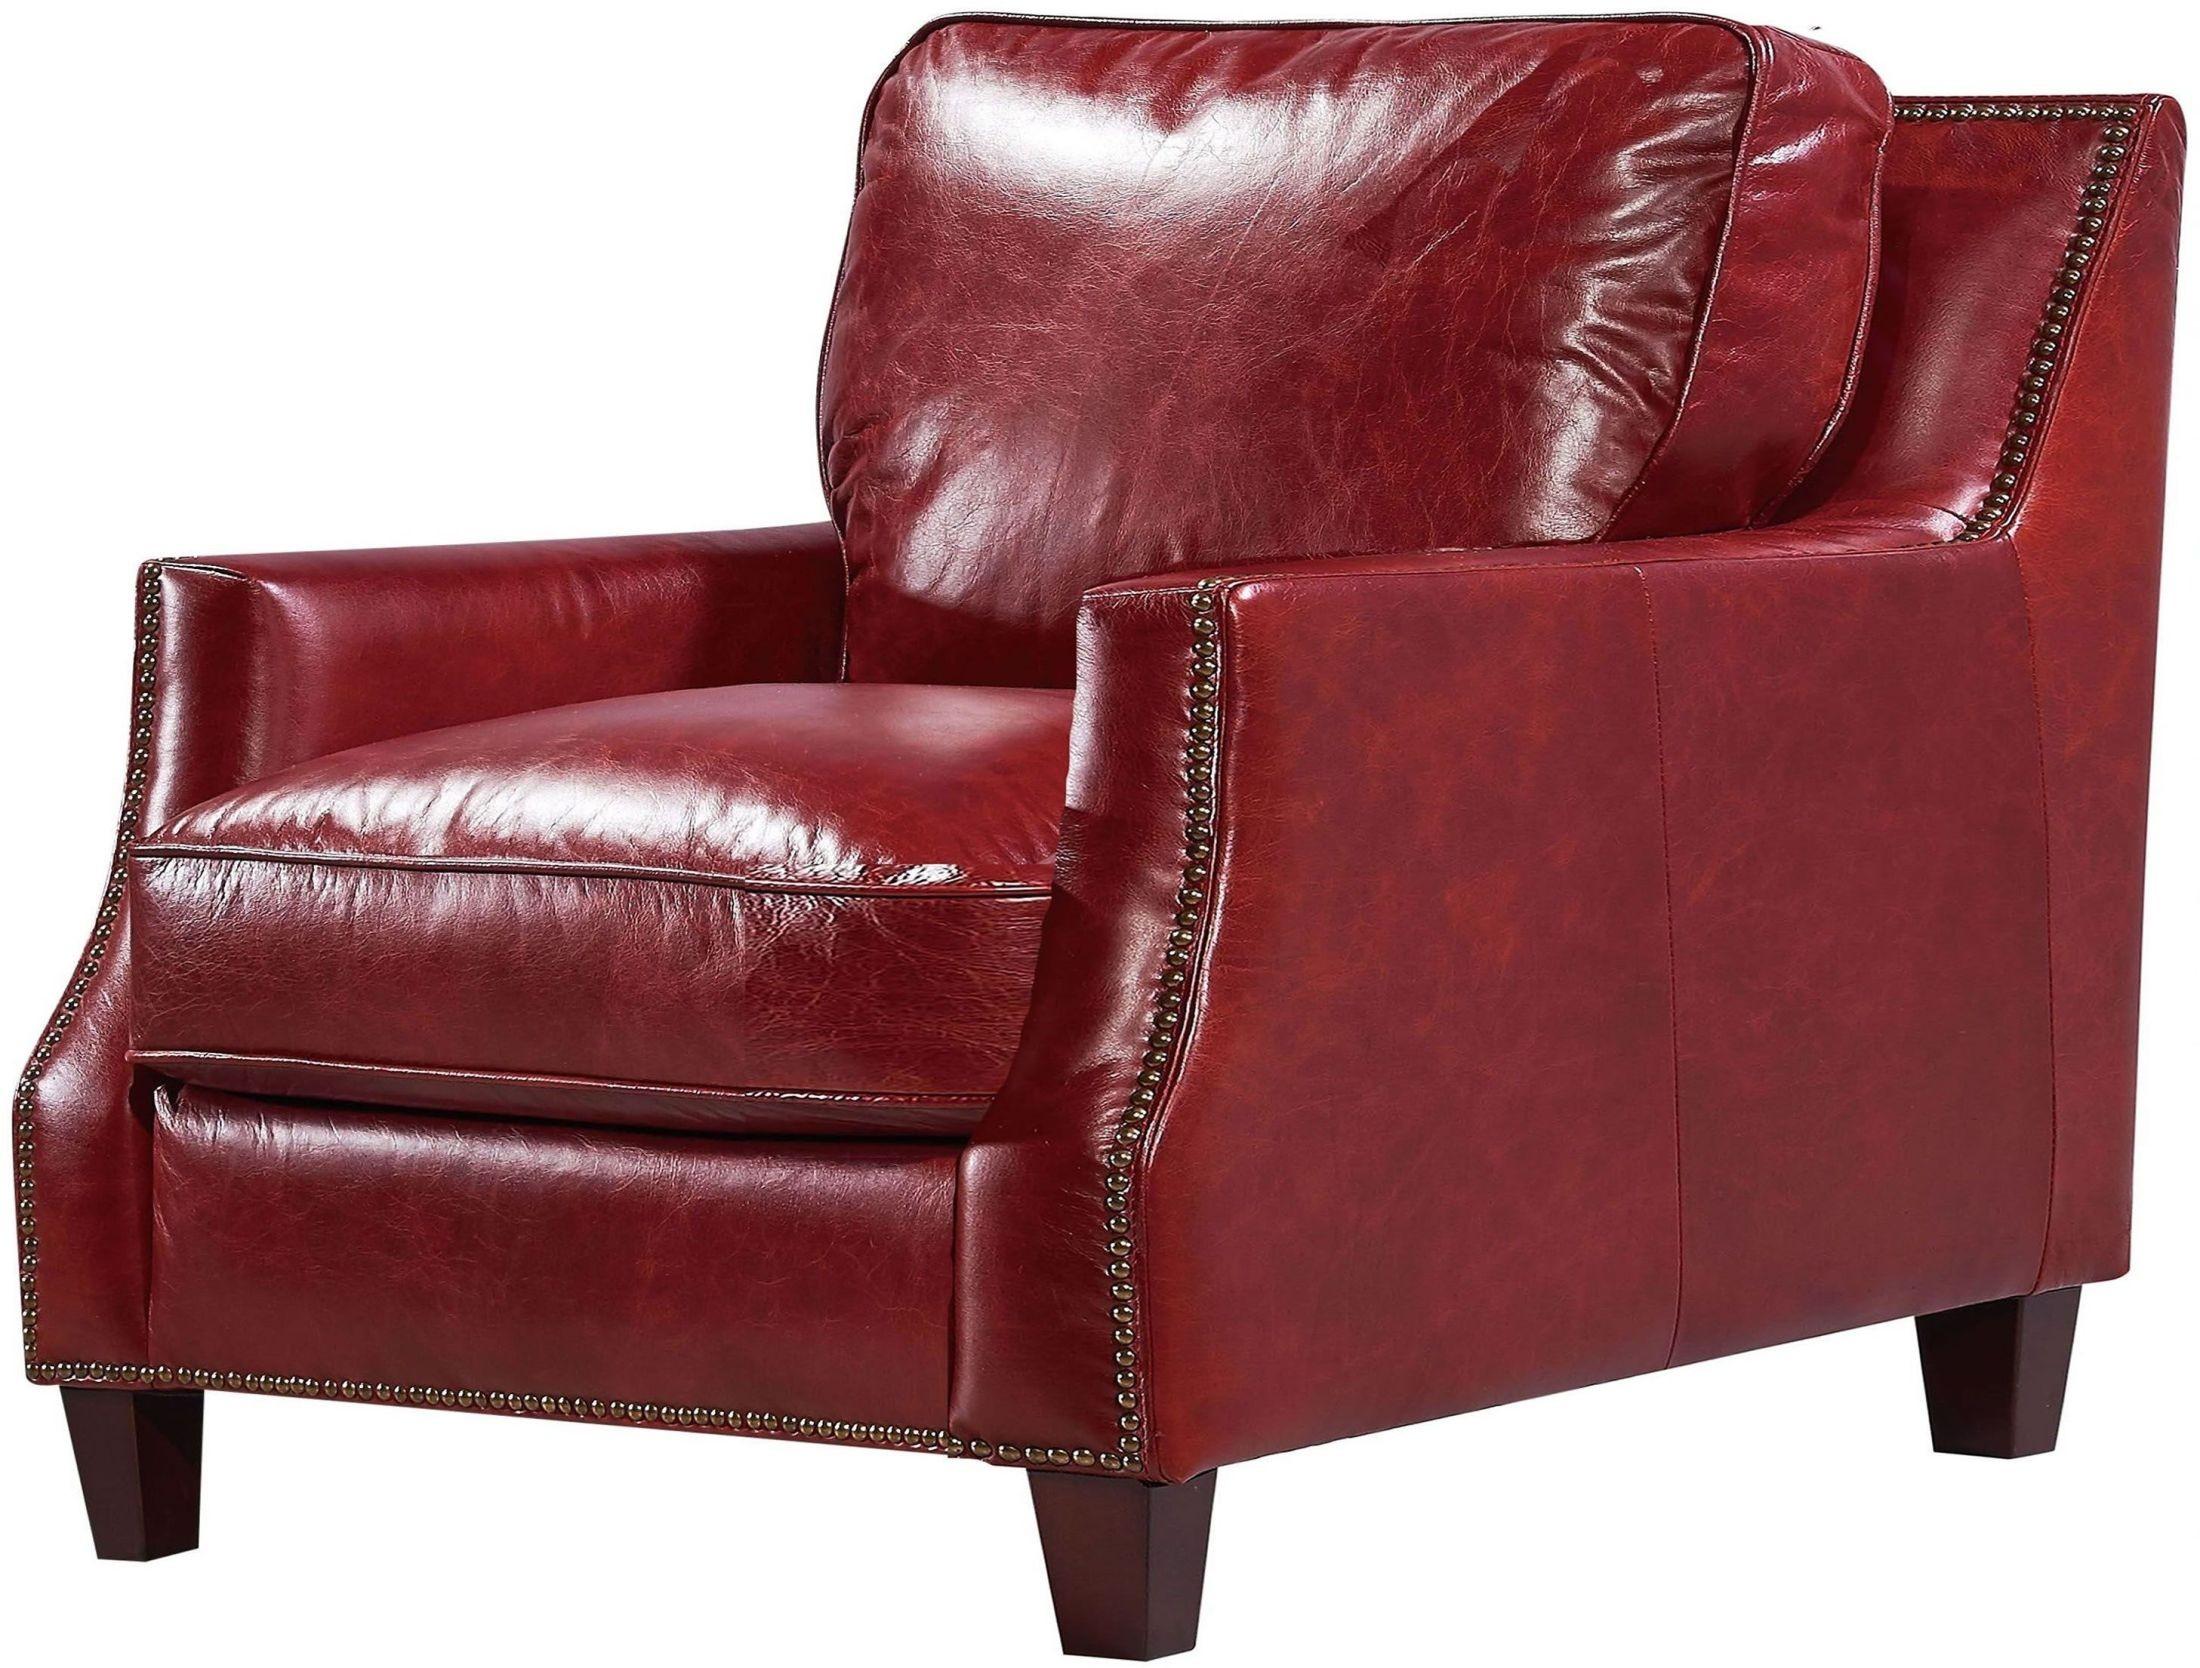 Georgetowne Oakridge Red Leather Chair 16696103015510